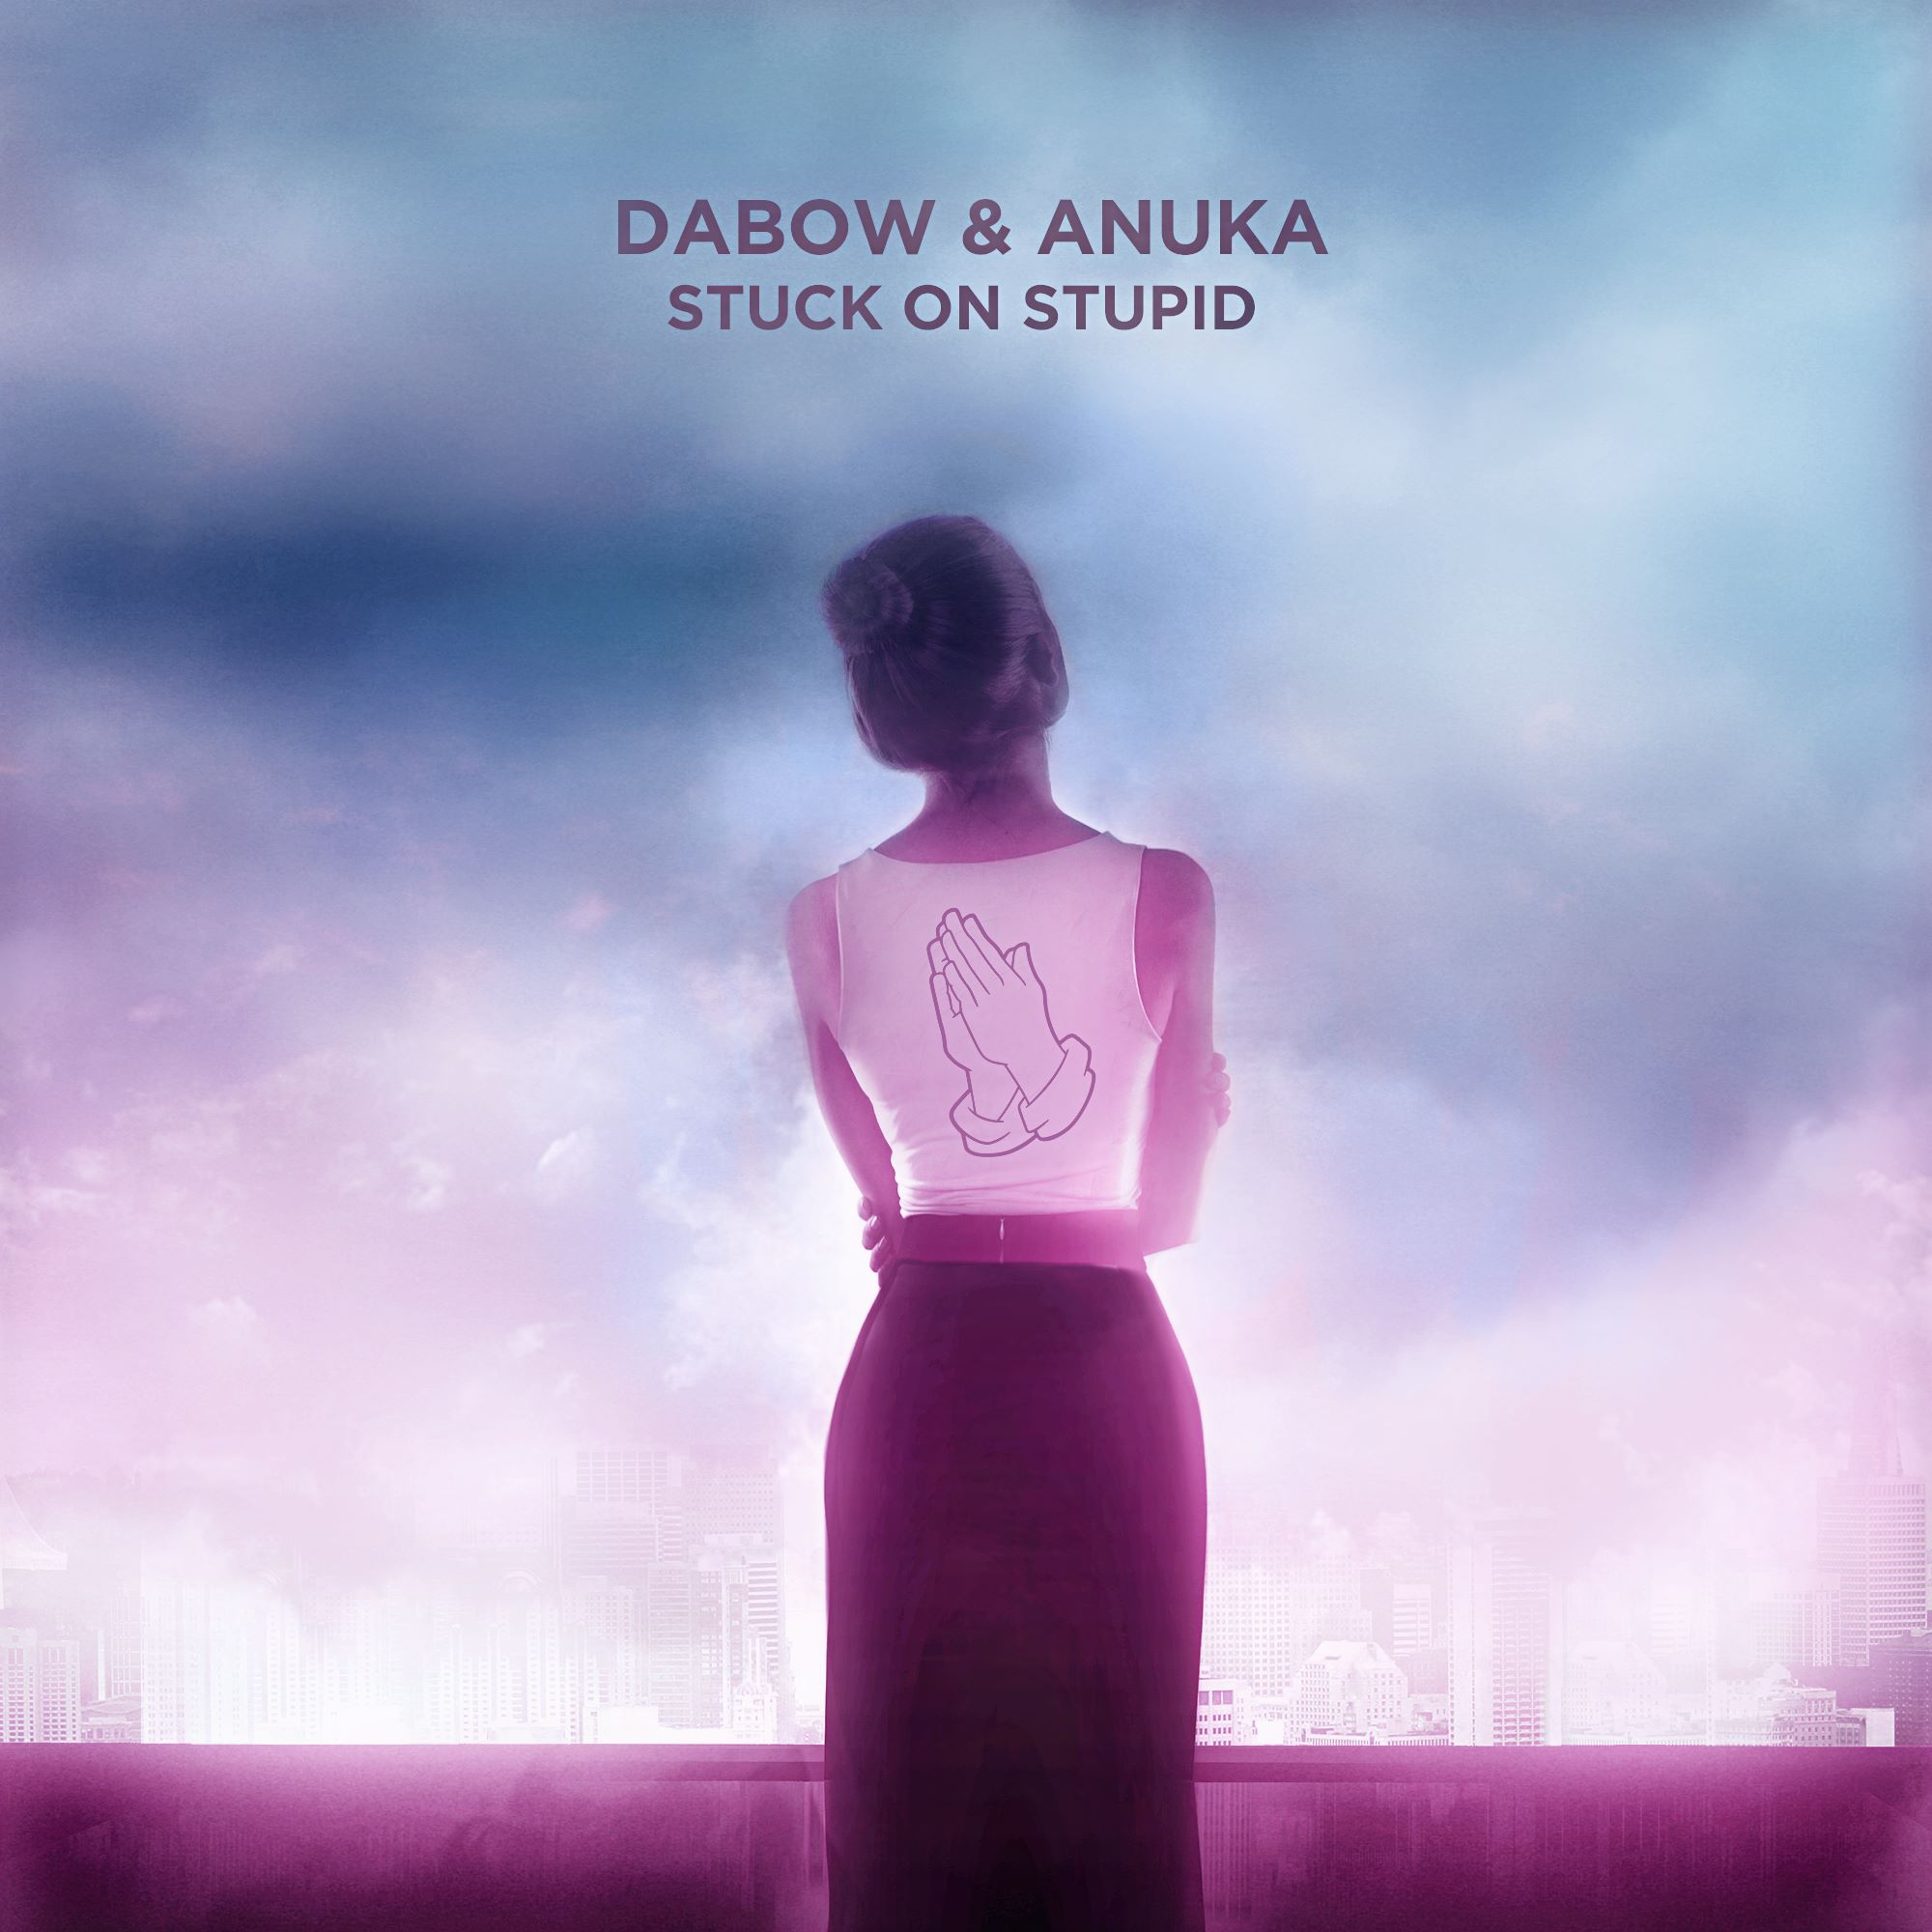 dabow and anuka have us  u0026quot stuck on stupid u0026quot